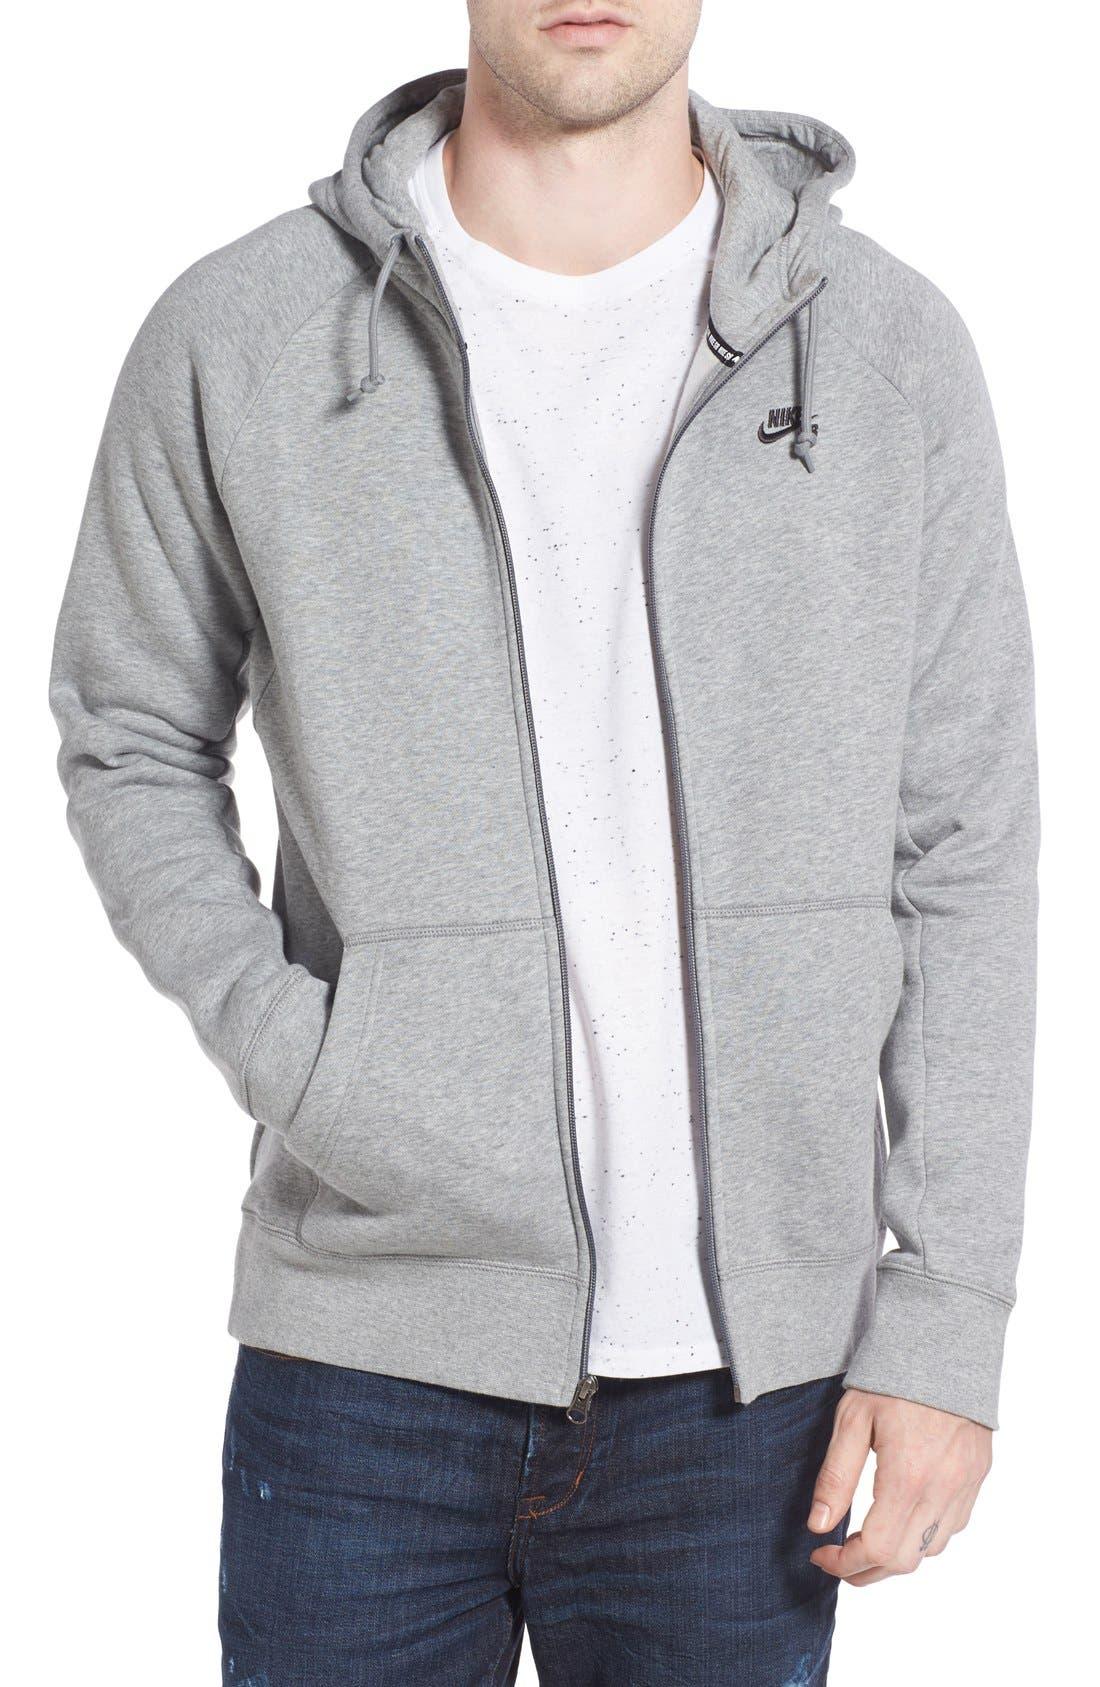 Main Image - Nike SB 'Icon' Zip Hoodie